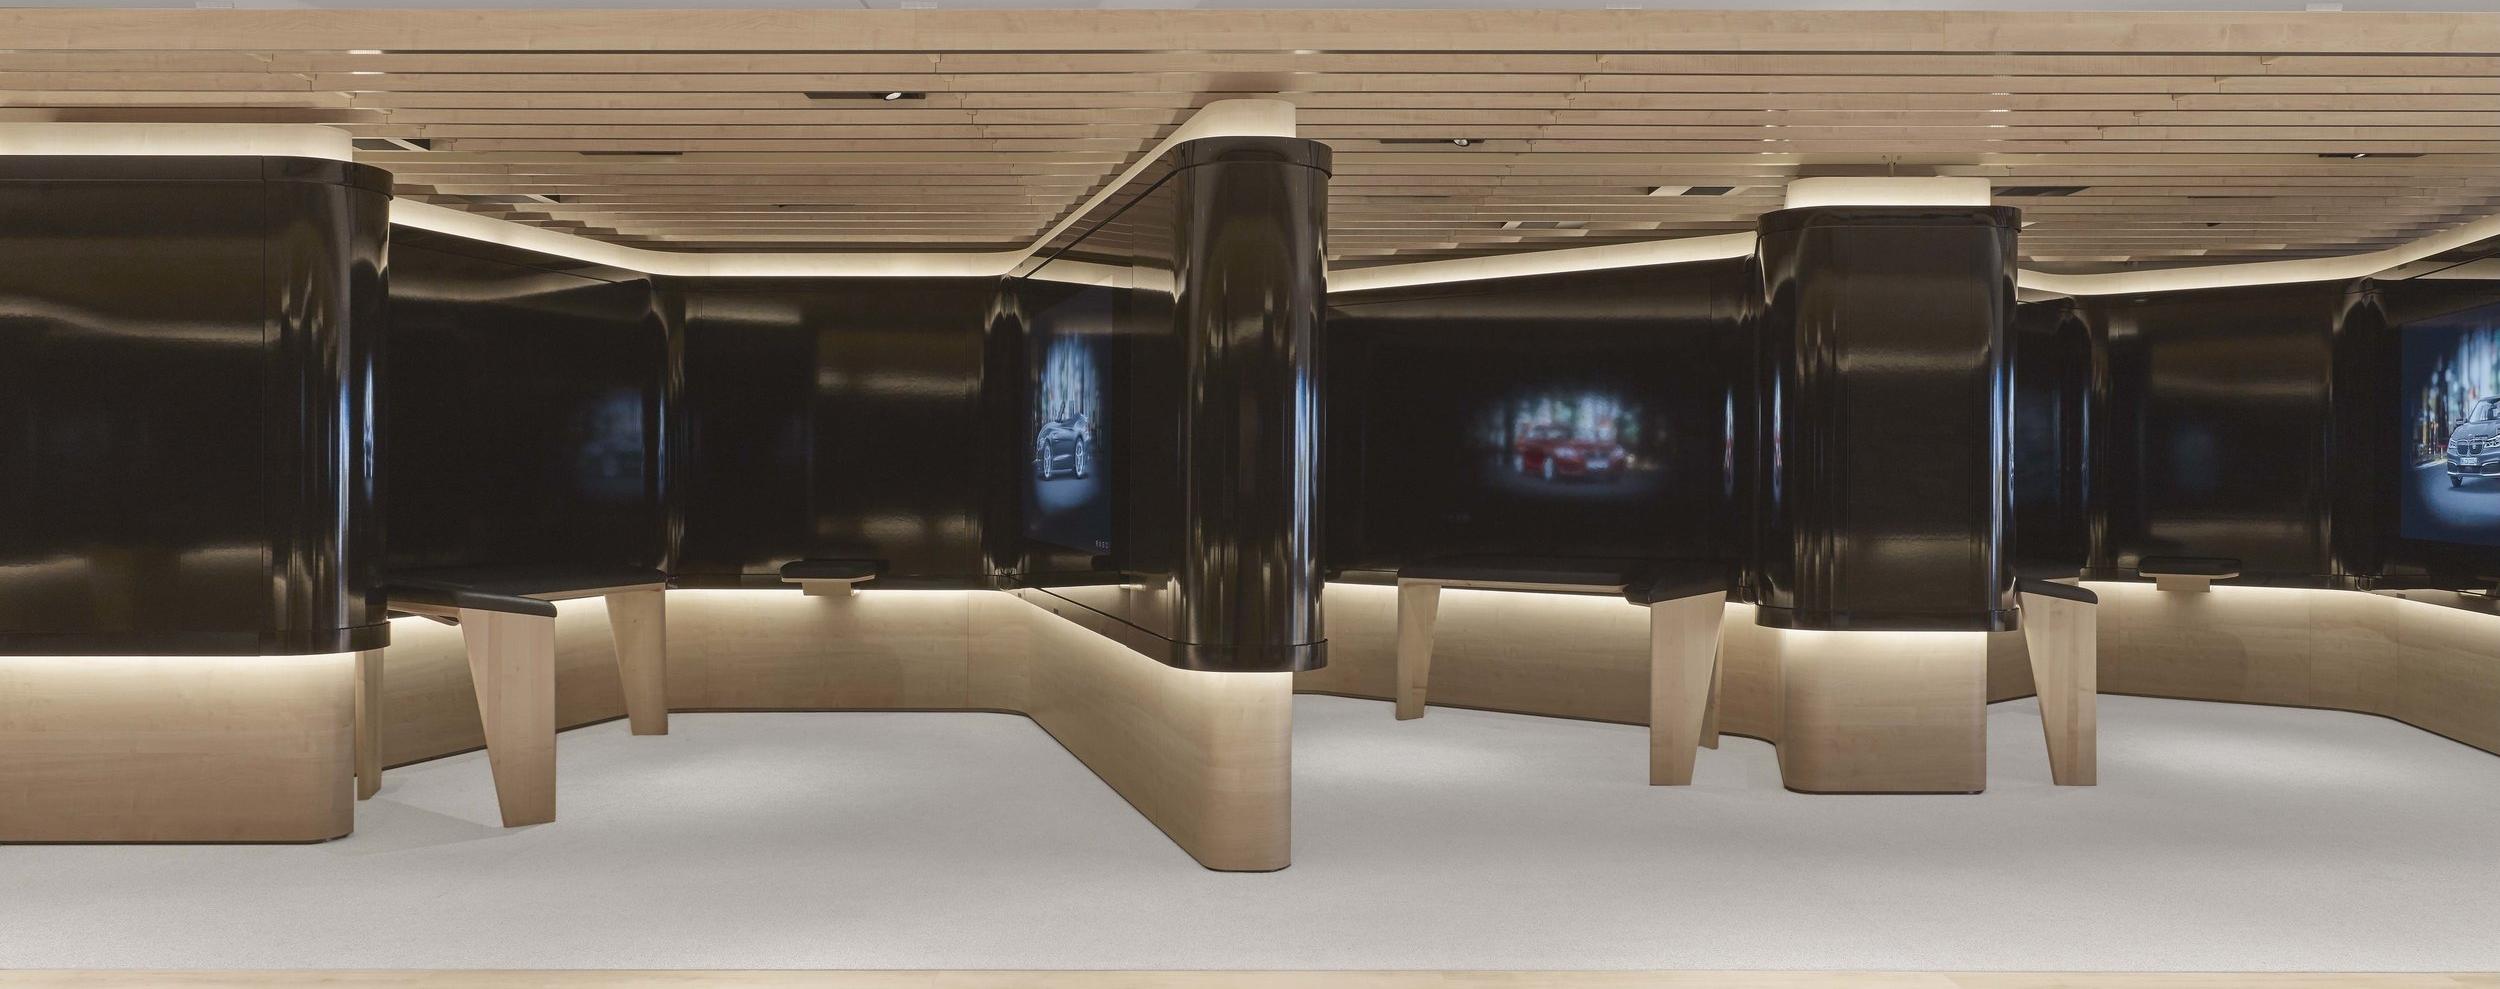 bmw-product-information-center_coorporate-interior-design_coordination-berlin_04.jpg